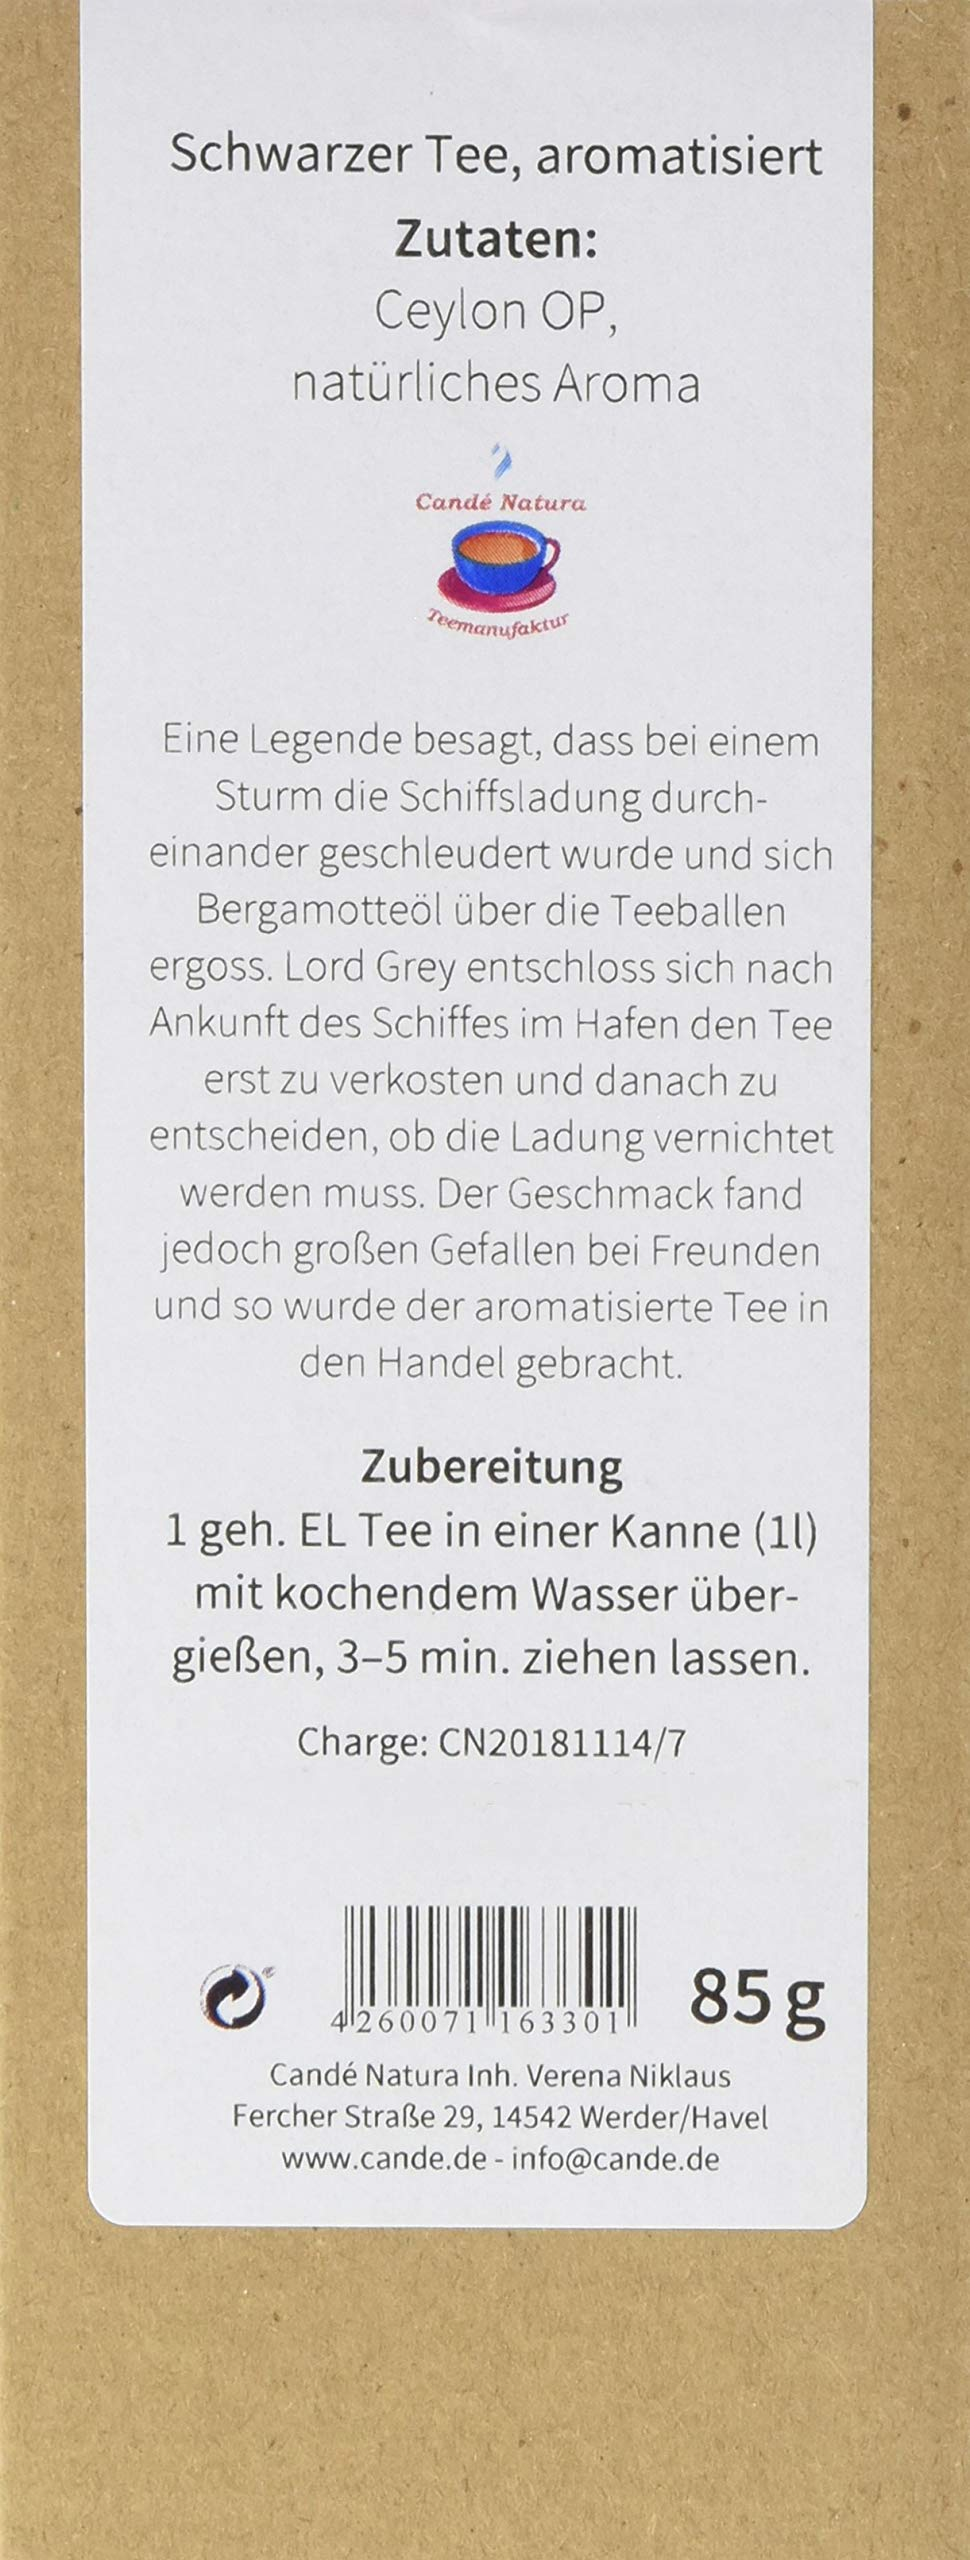 Cand-Natura-Teemanufaktur-Earl-Grey-Schwarzer-Tee-aromatisiert-5er-Pack-5-x-85-g